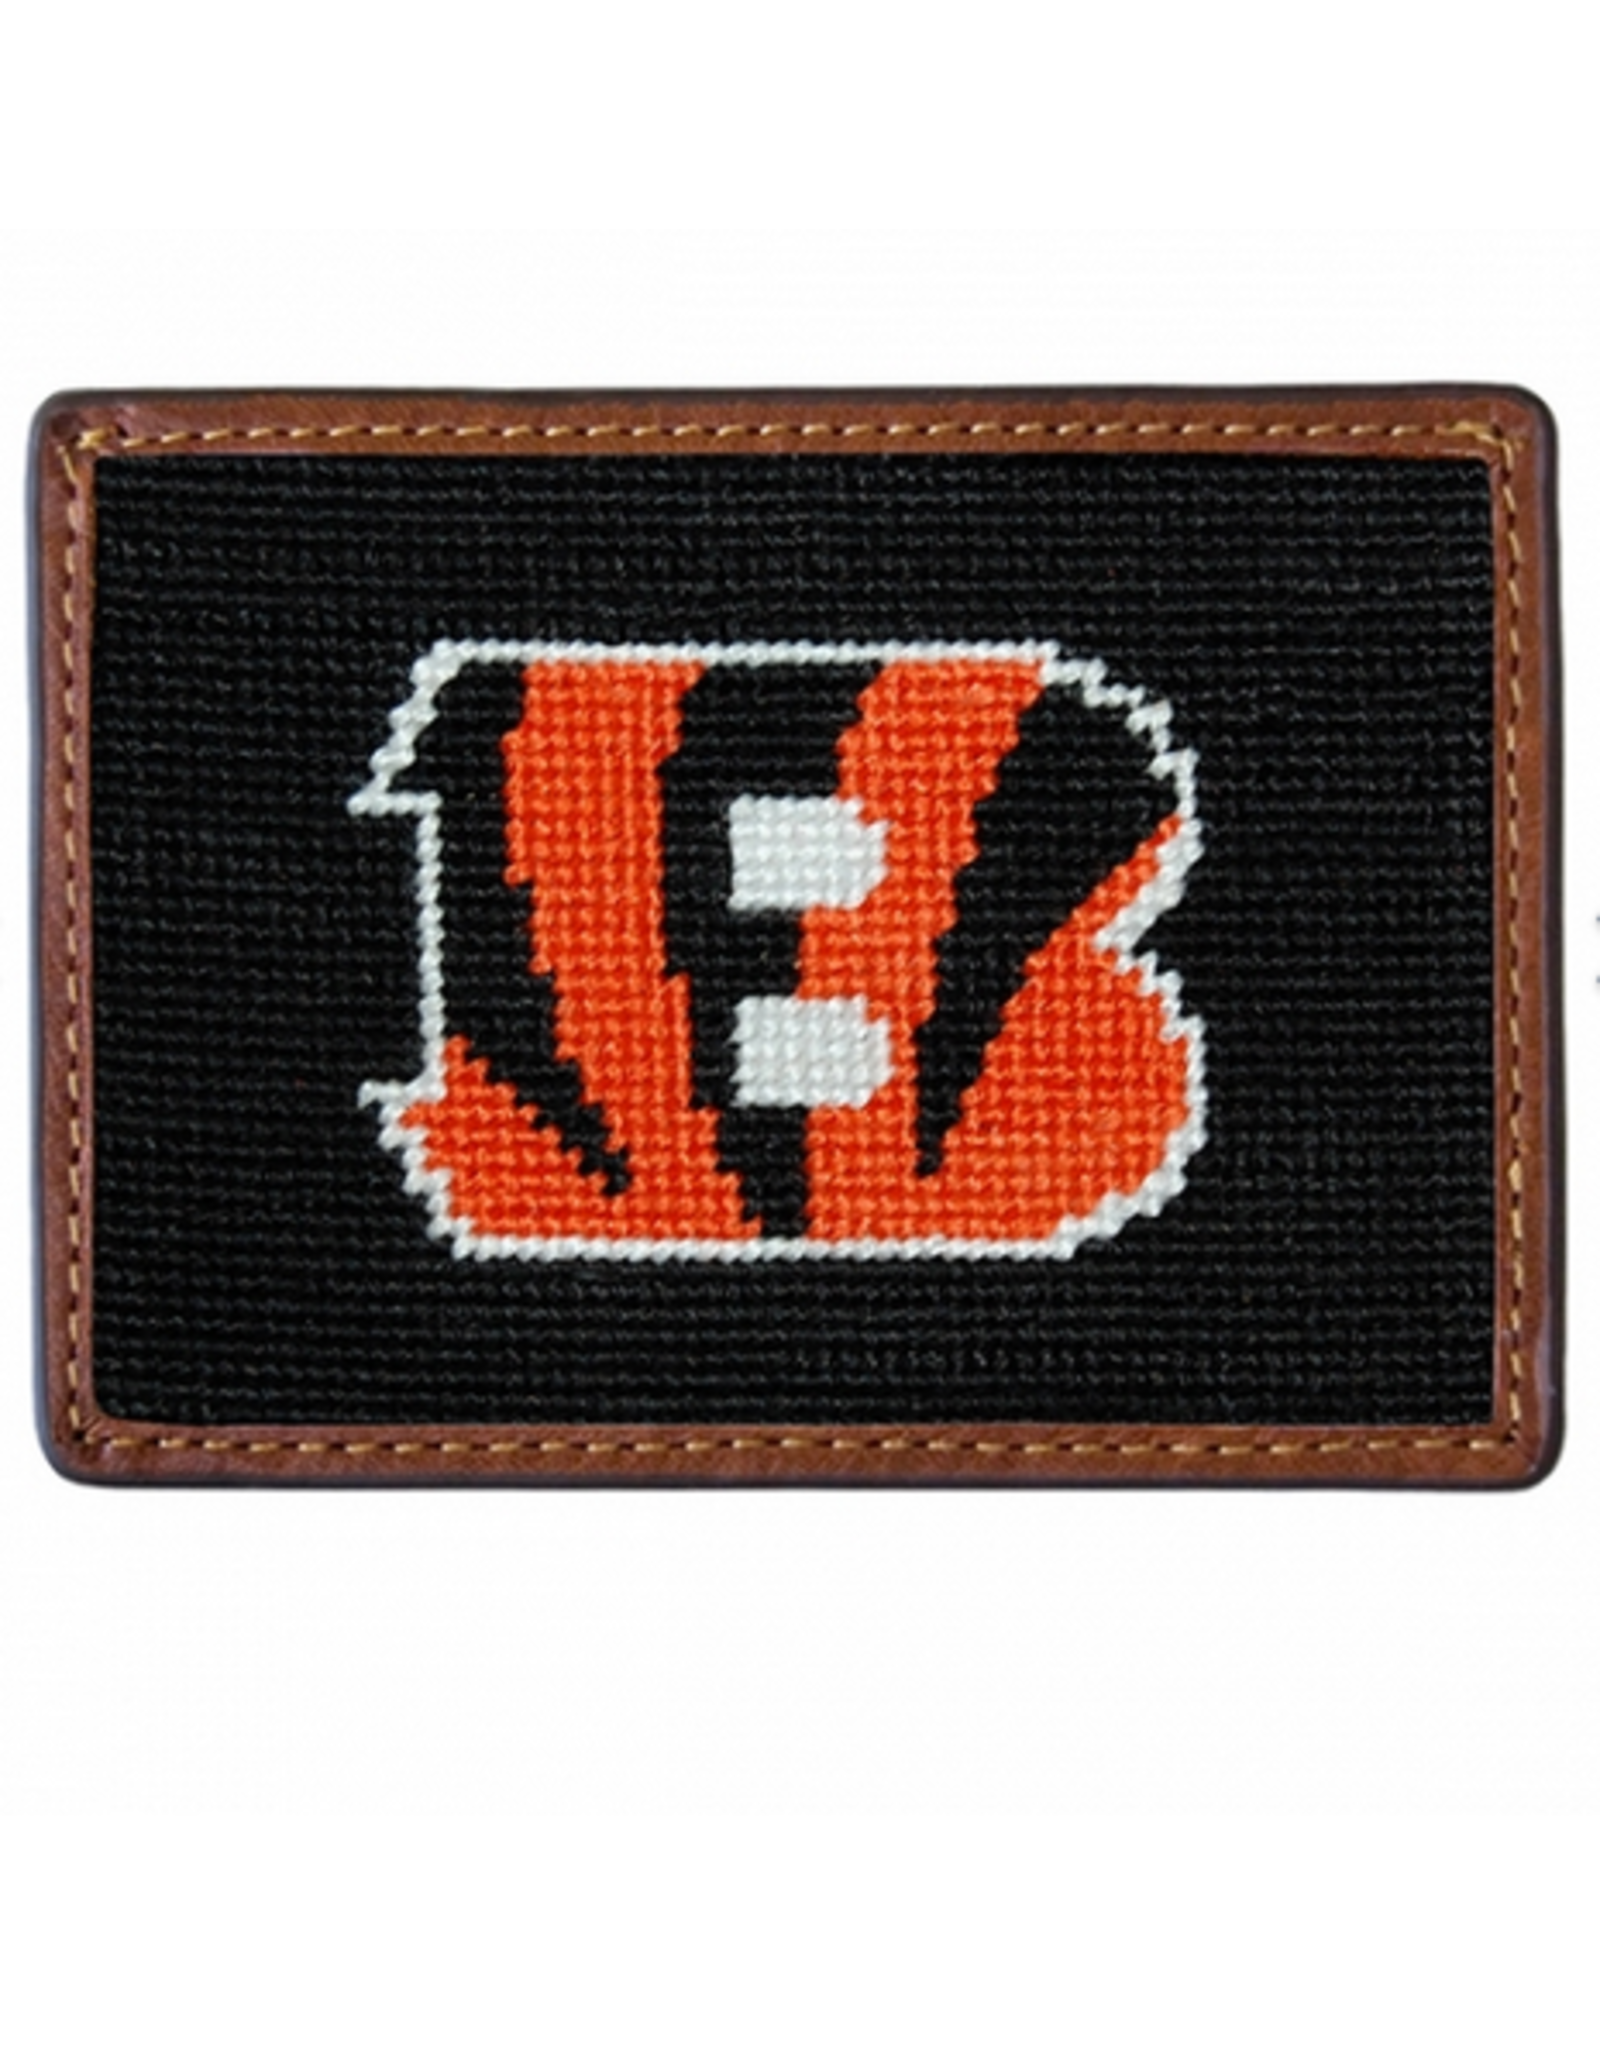 Smathers & Branson S&B Needlepoint Card Wallet, Cincinnati Bengals